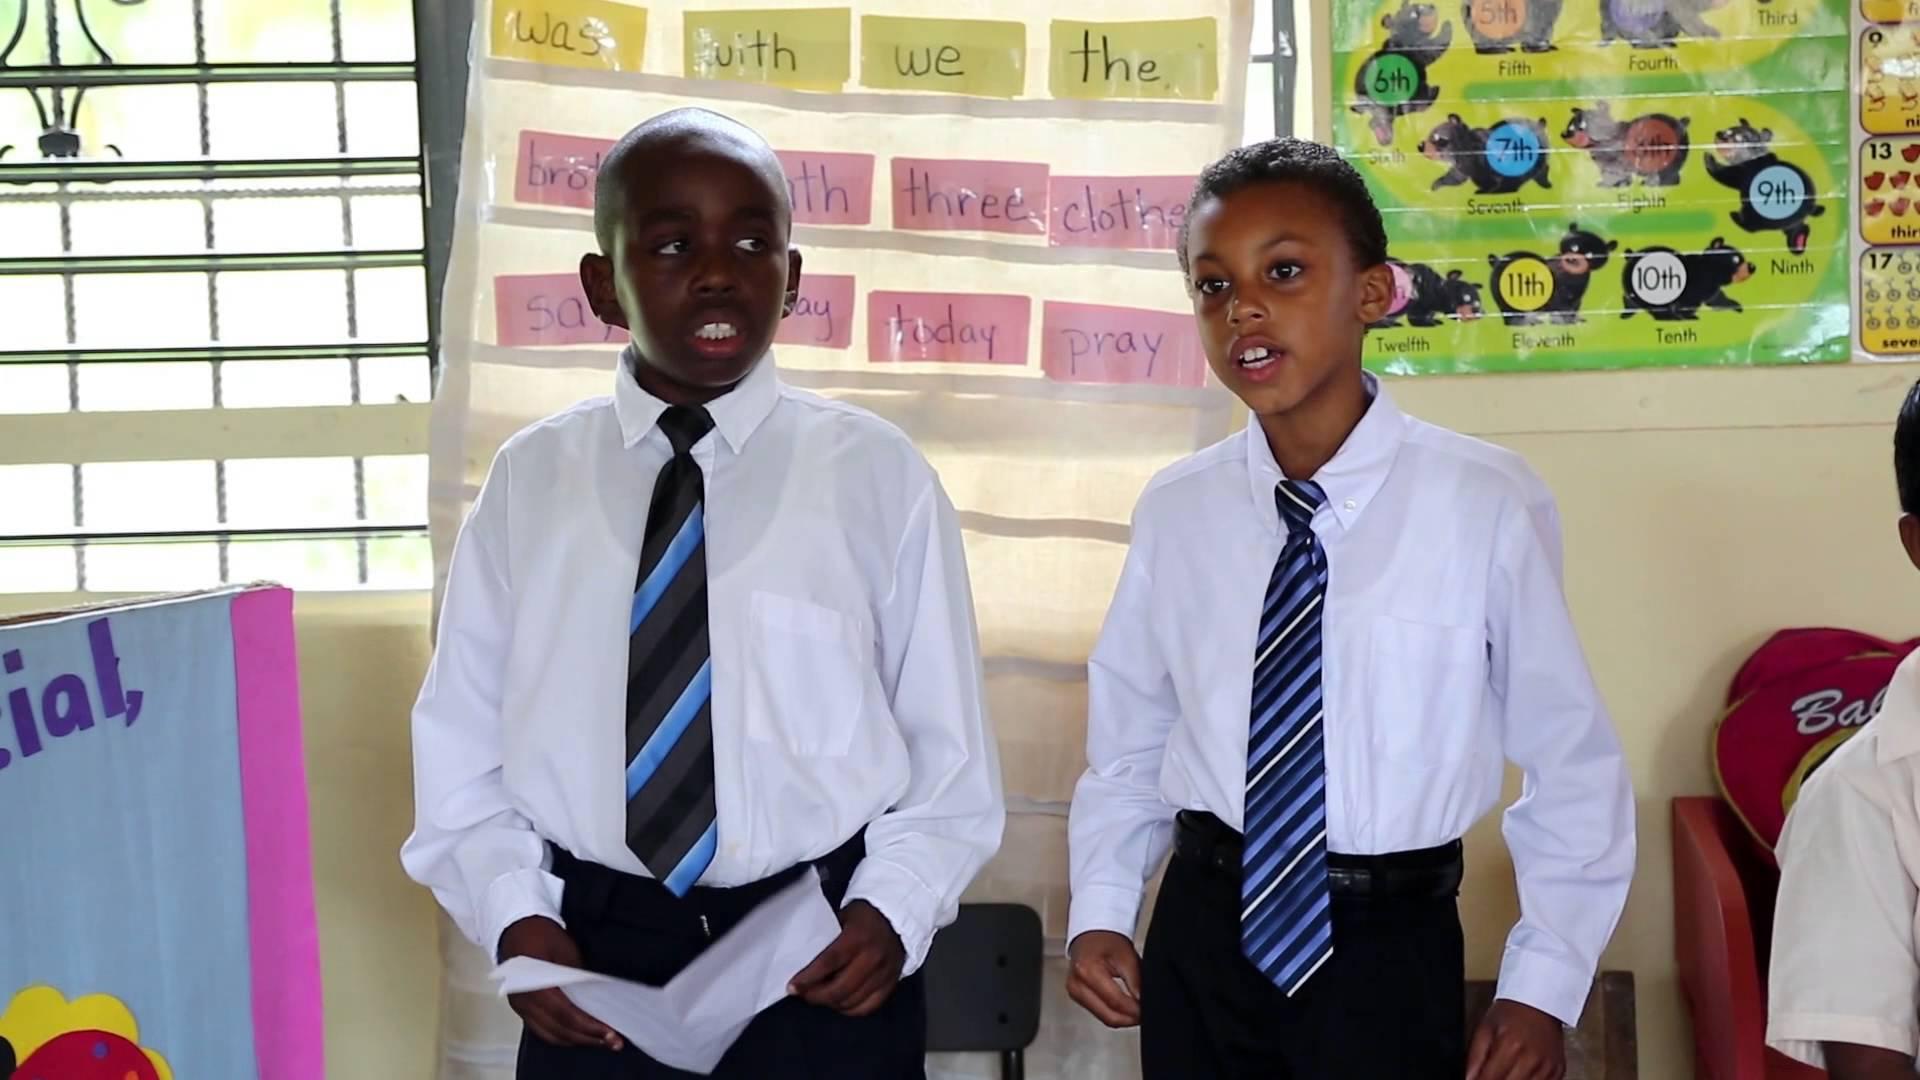 The Little Preacher Boy - Belize